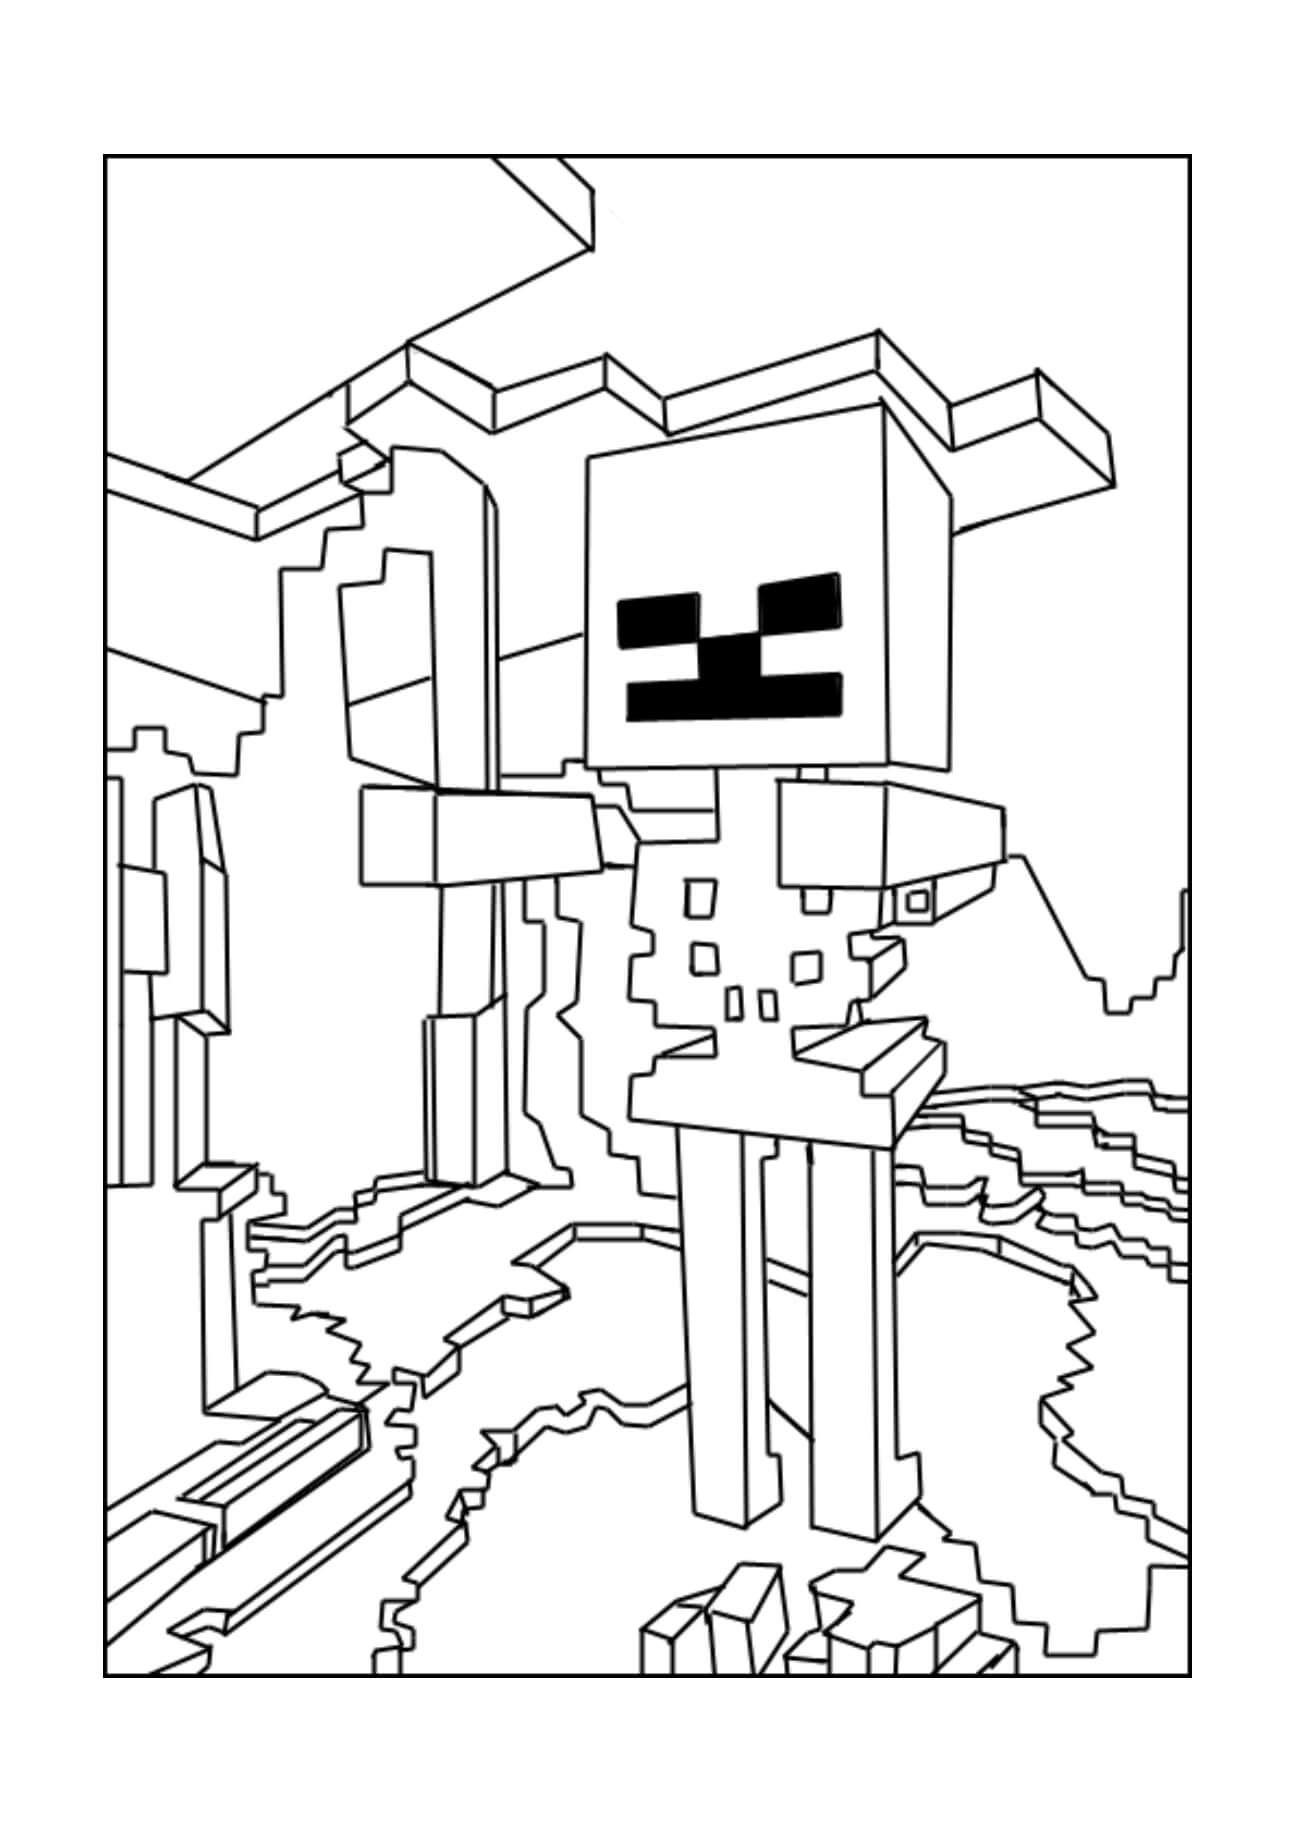 Pin de ScribbleFun en Minecraft Coloring Pages | Pinterest